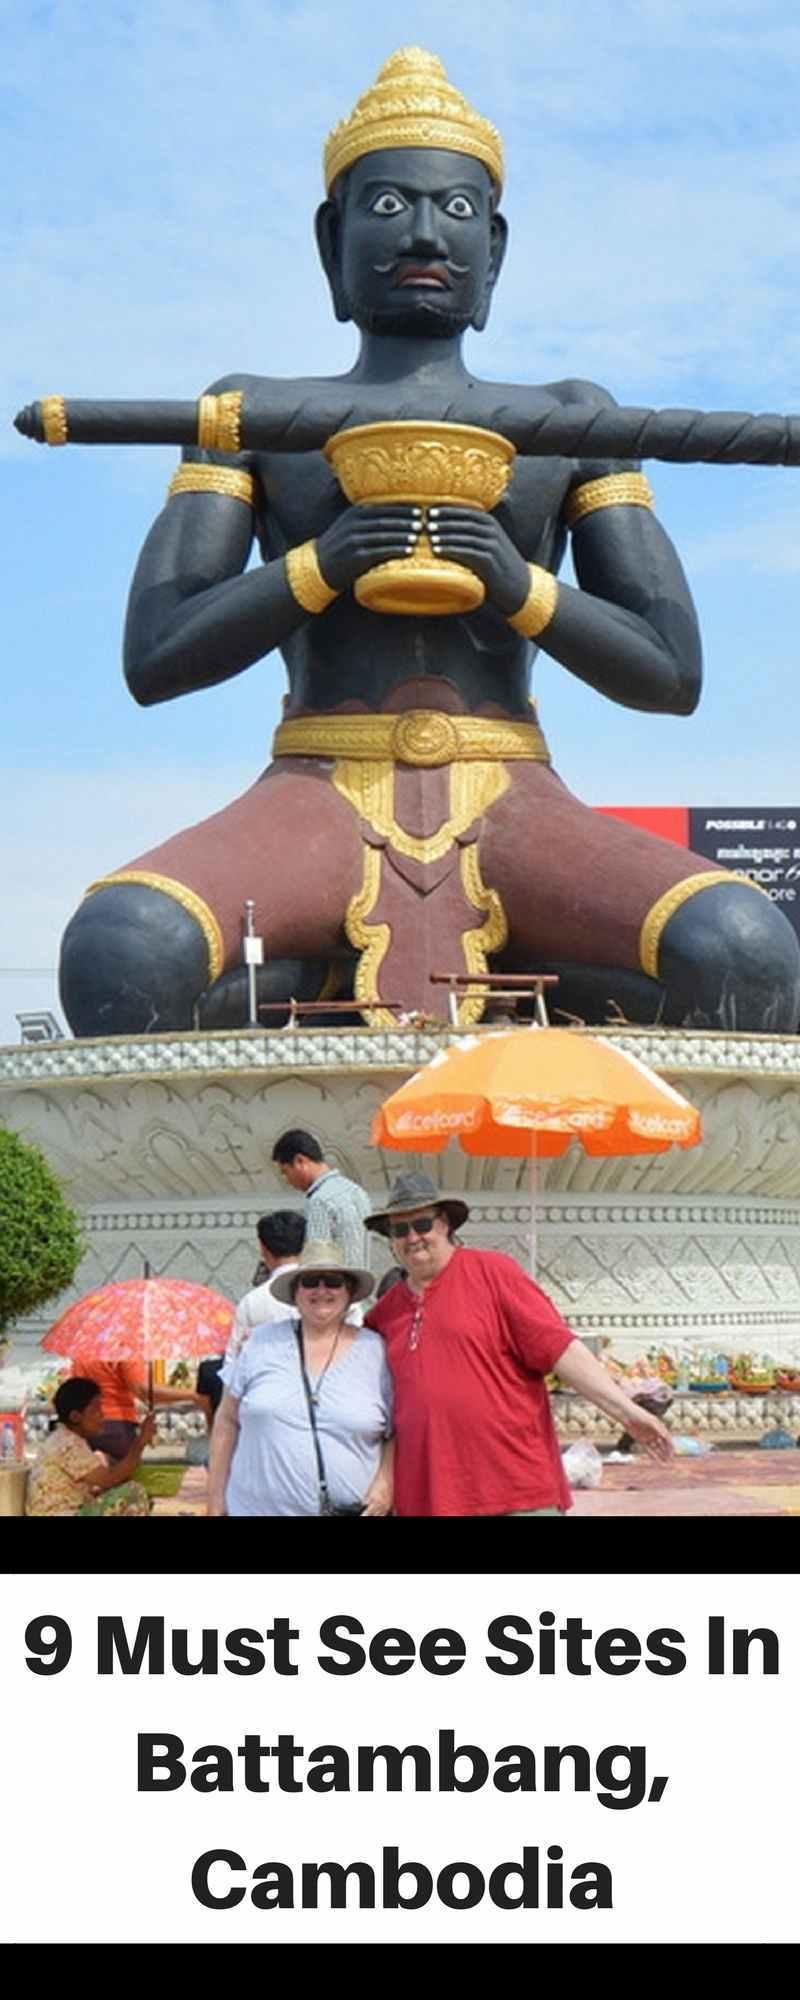 9 Must See Sites of Battambang, Cambodia | Battambang | Cambodia | Siem Reap | SE Asia | SE Asia Packing List | SE Asia Itinerary | SE Asia Packing List | SE Asia Travel | SE Asia Outfits | Travel | ARoadtoTravel.com